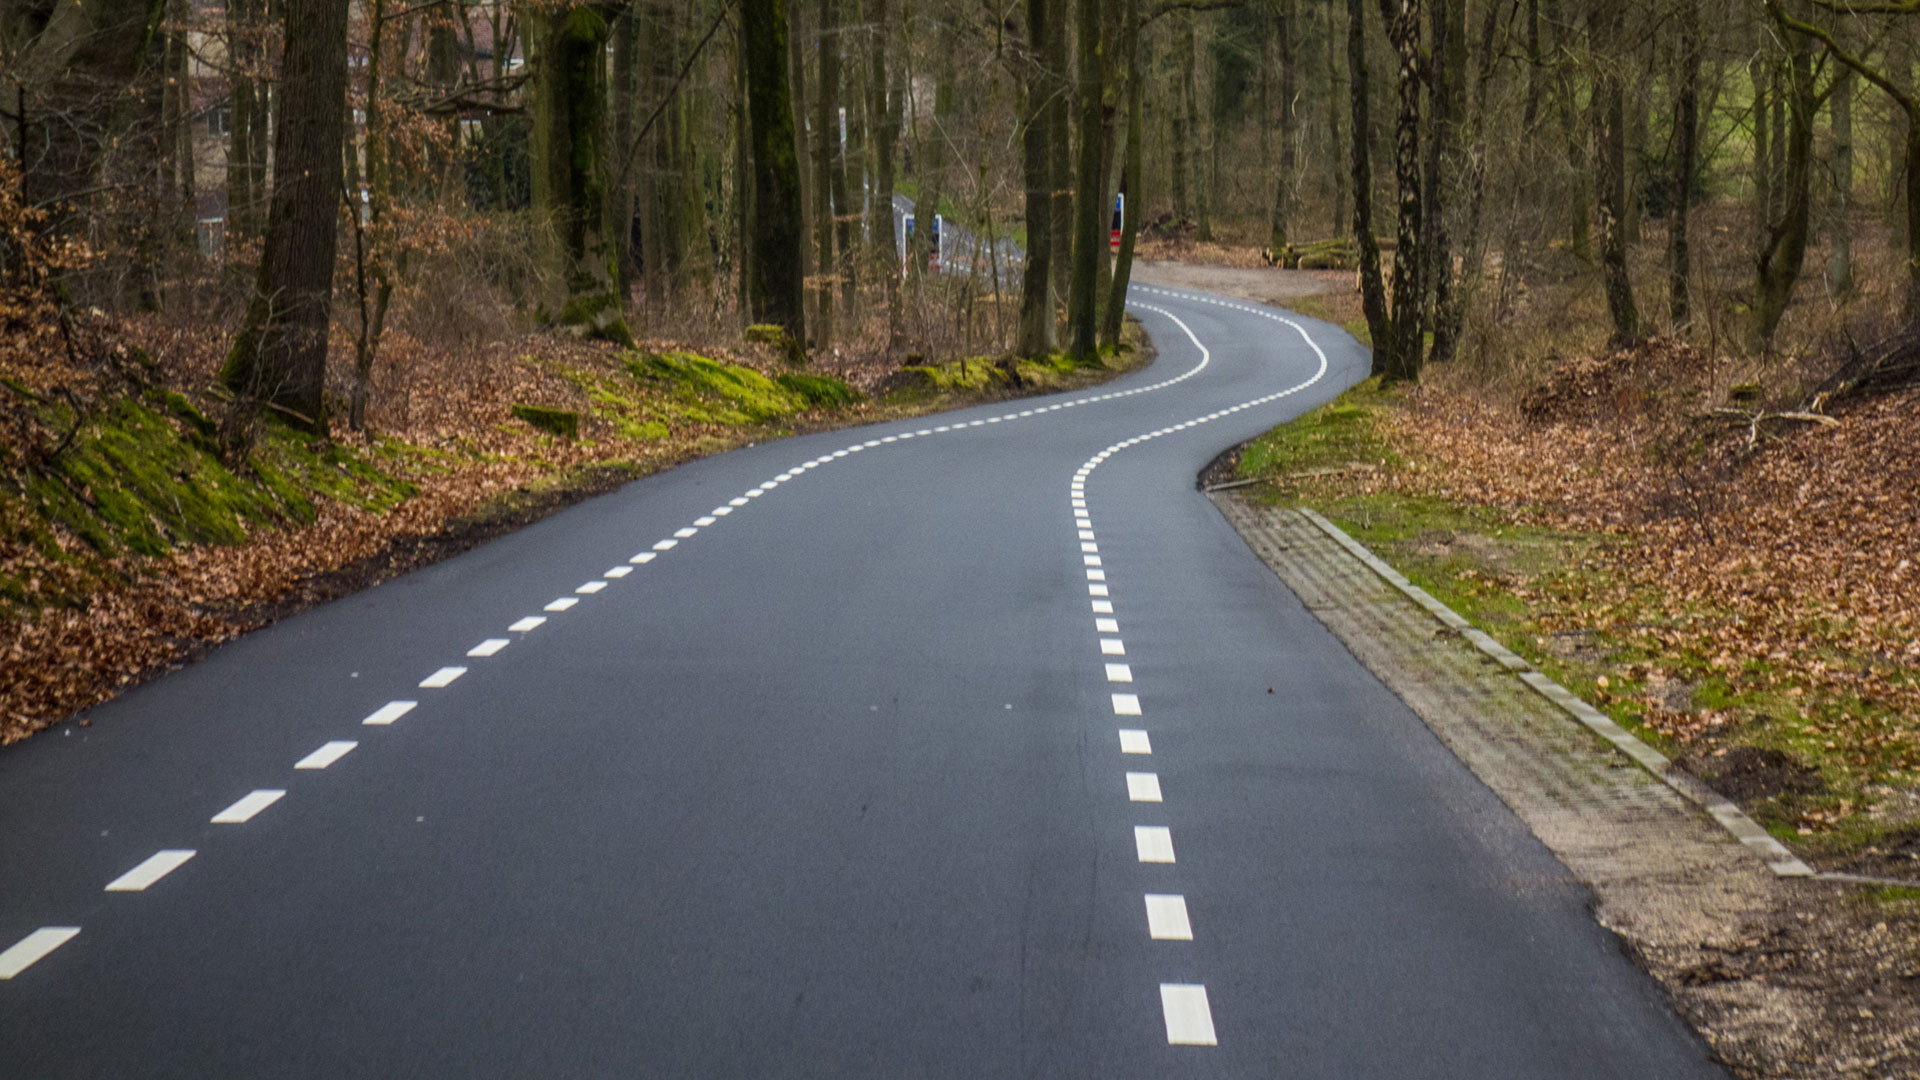 Wielrennen op de Utrechtse Heuvelrug: drie gave routes